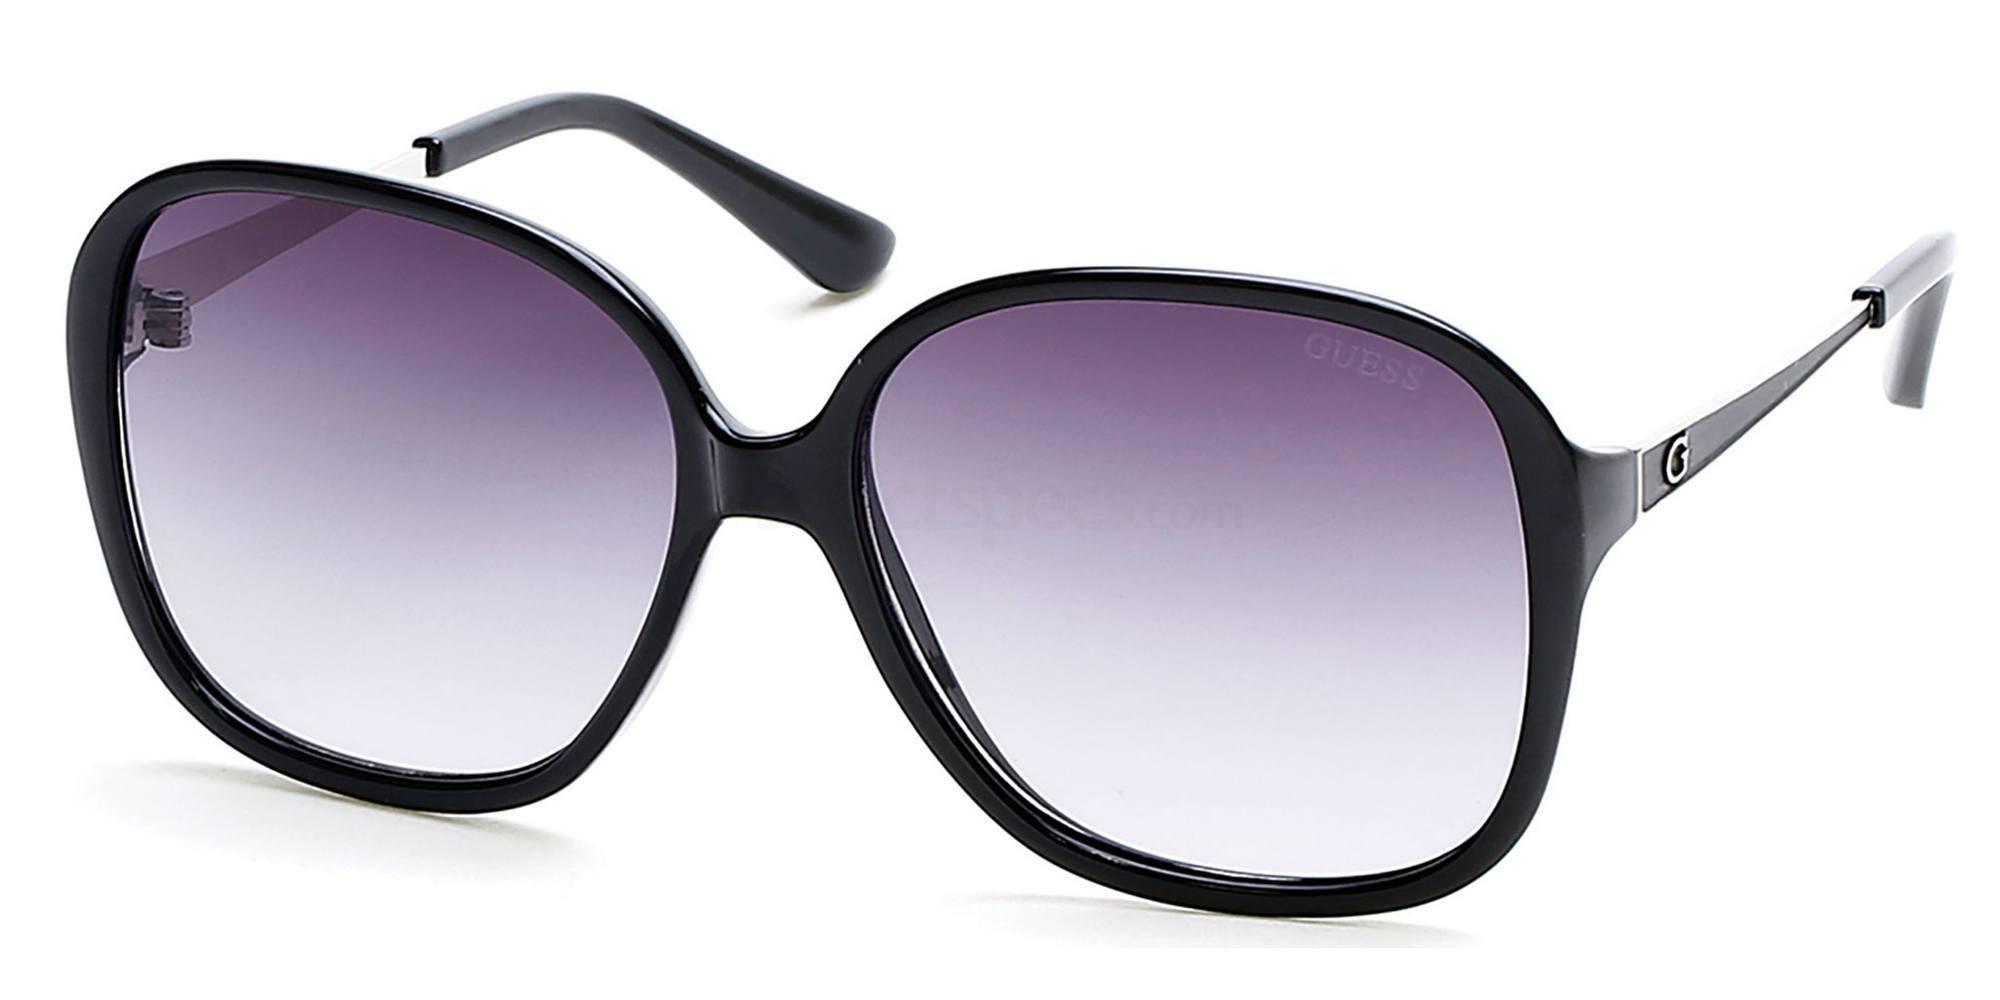 01B GU7462 Sunglasses, Guess